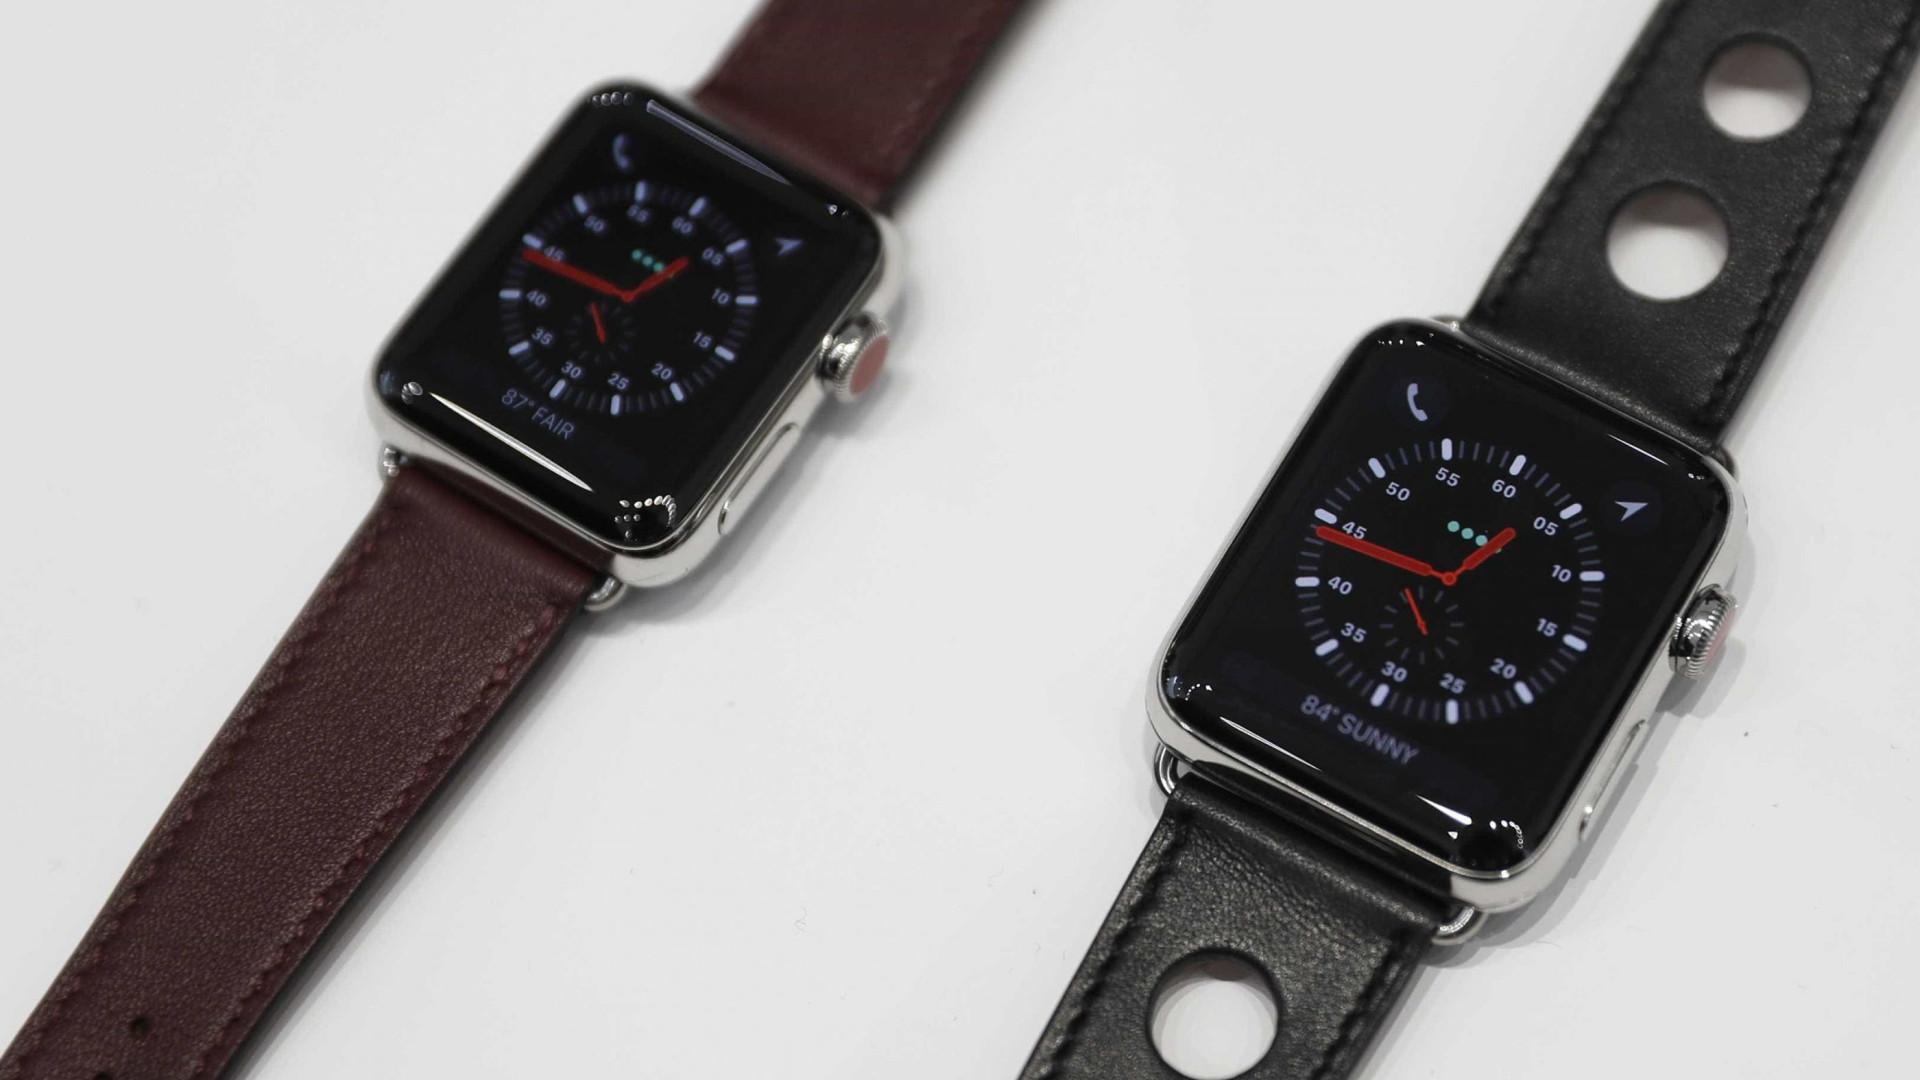 Apple Watch deve chegar ao mercado com problemas de conectividade